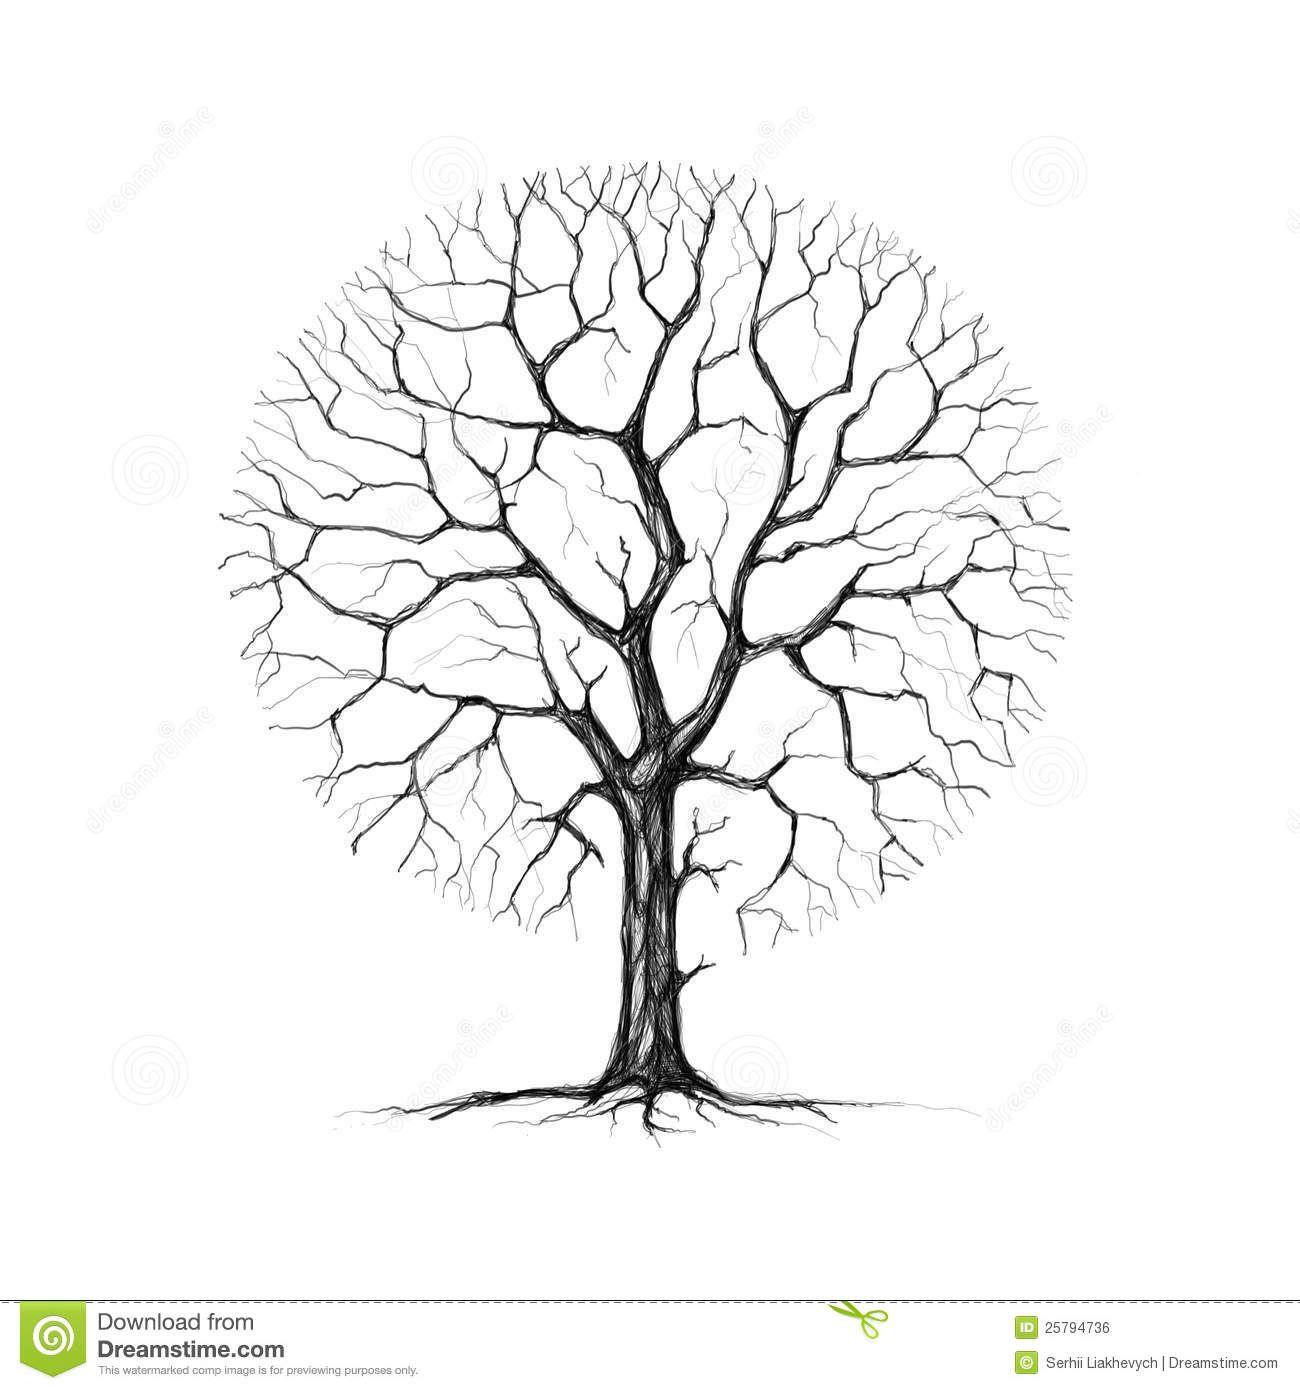 Southern Live Oak Drawing